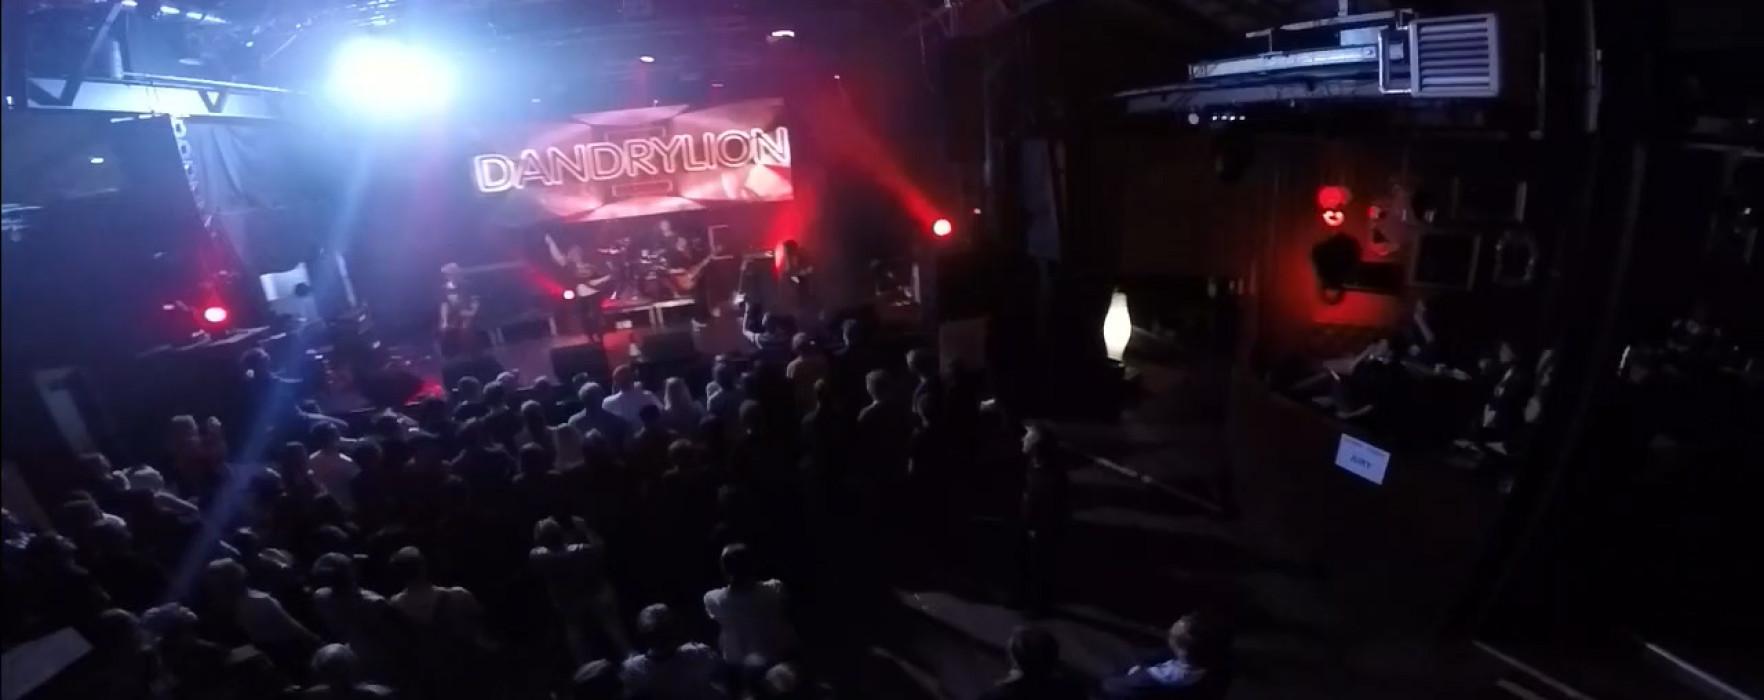 Glimt – Dandrylion på Livekarusellen